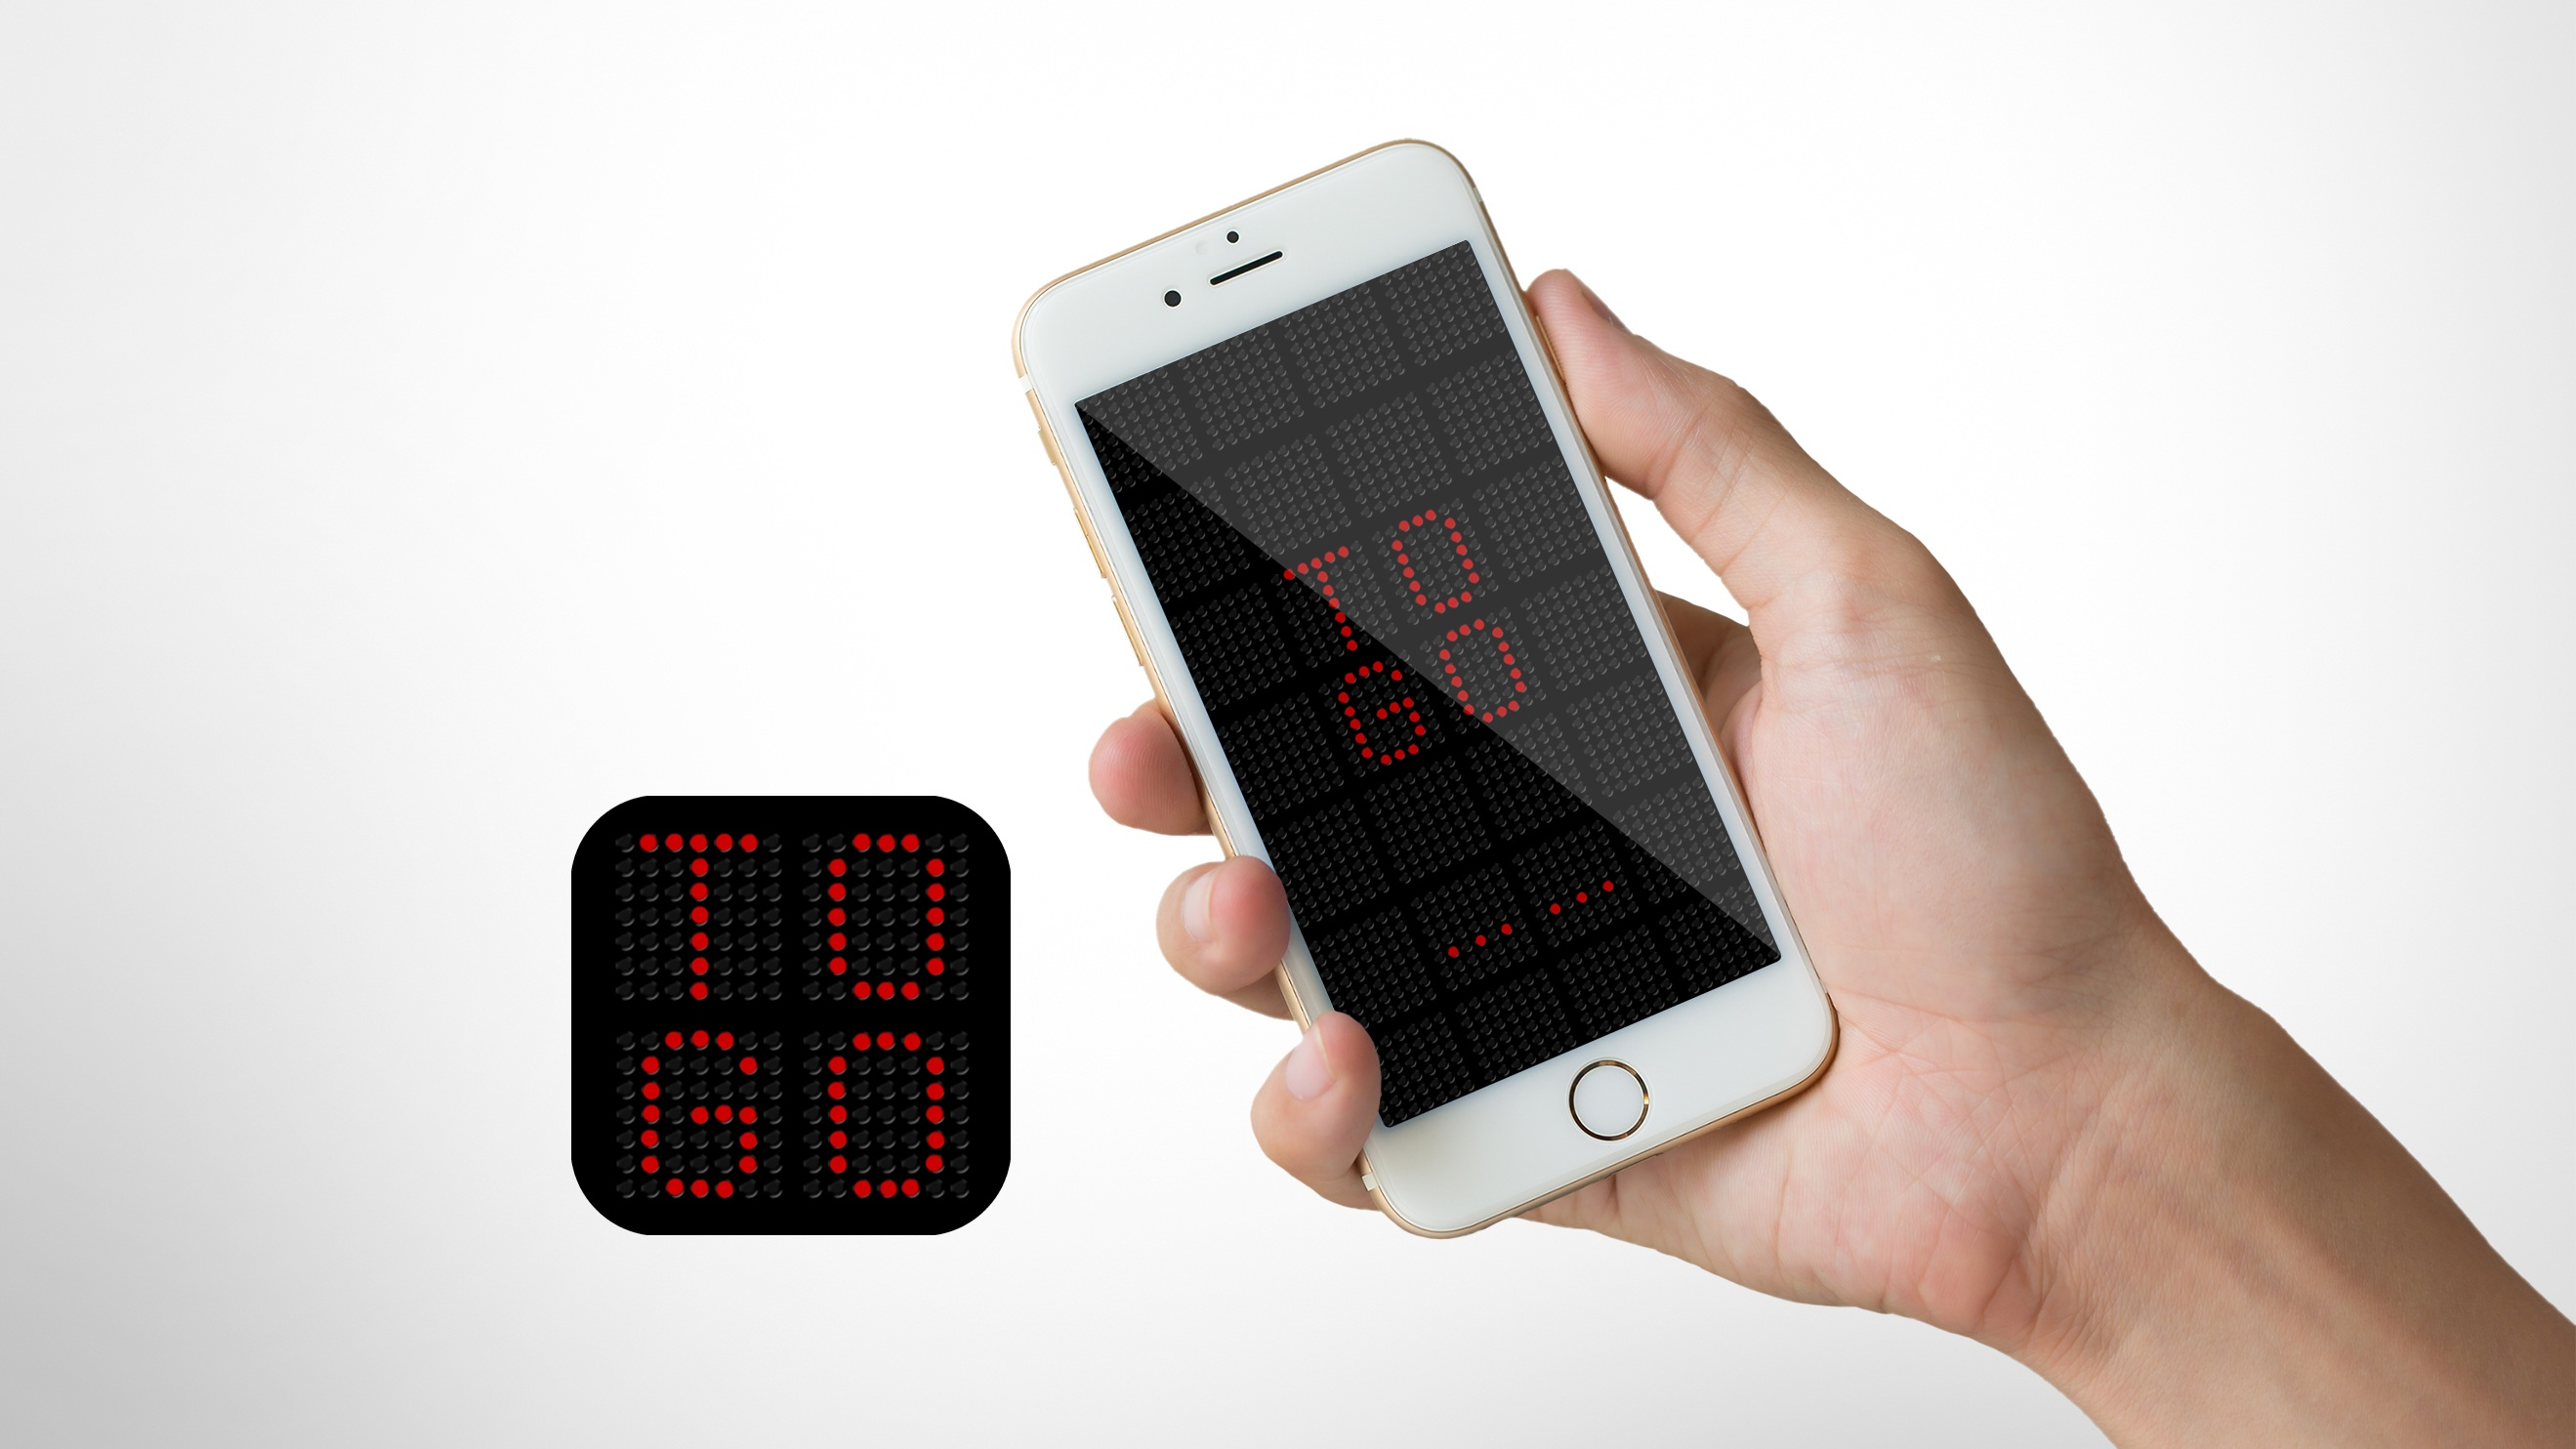 Разработать логотип и экран загрузки приложения фото f_5915a9980a243a66.jpg